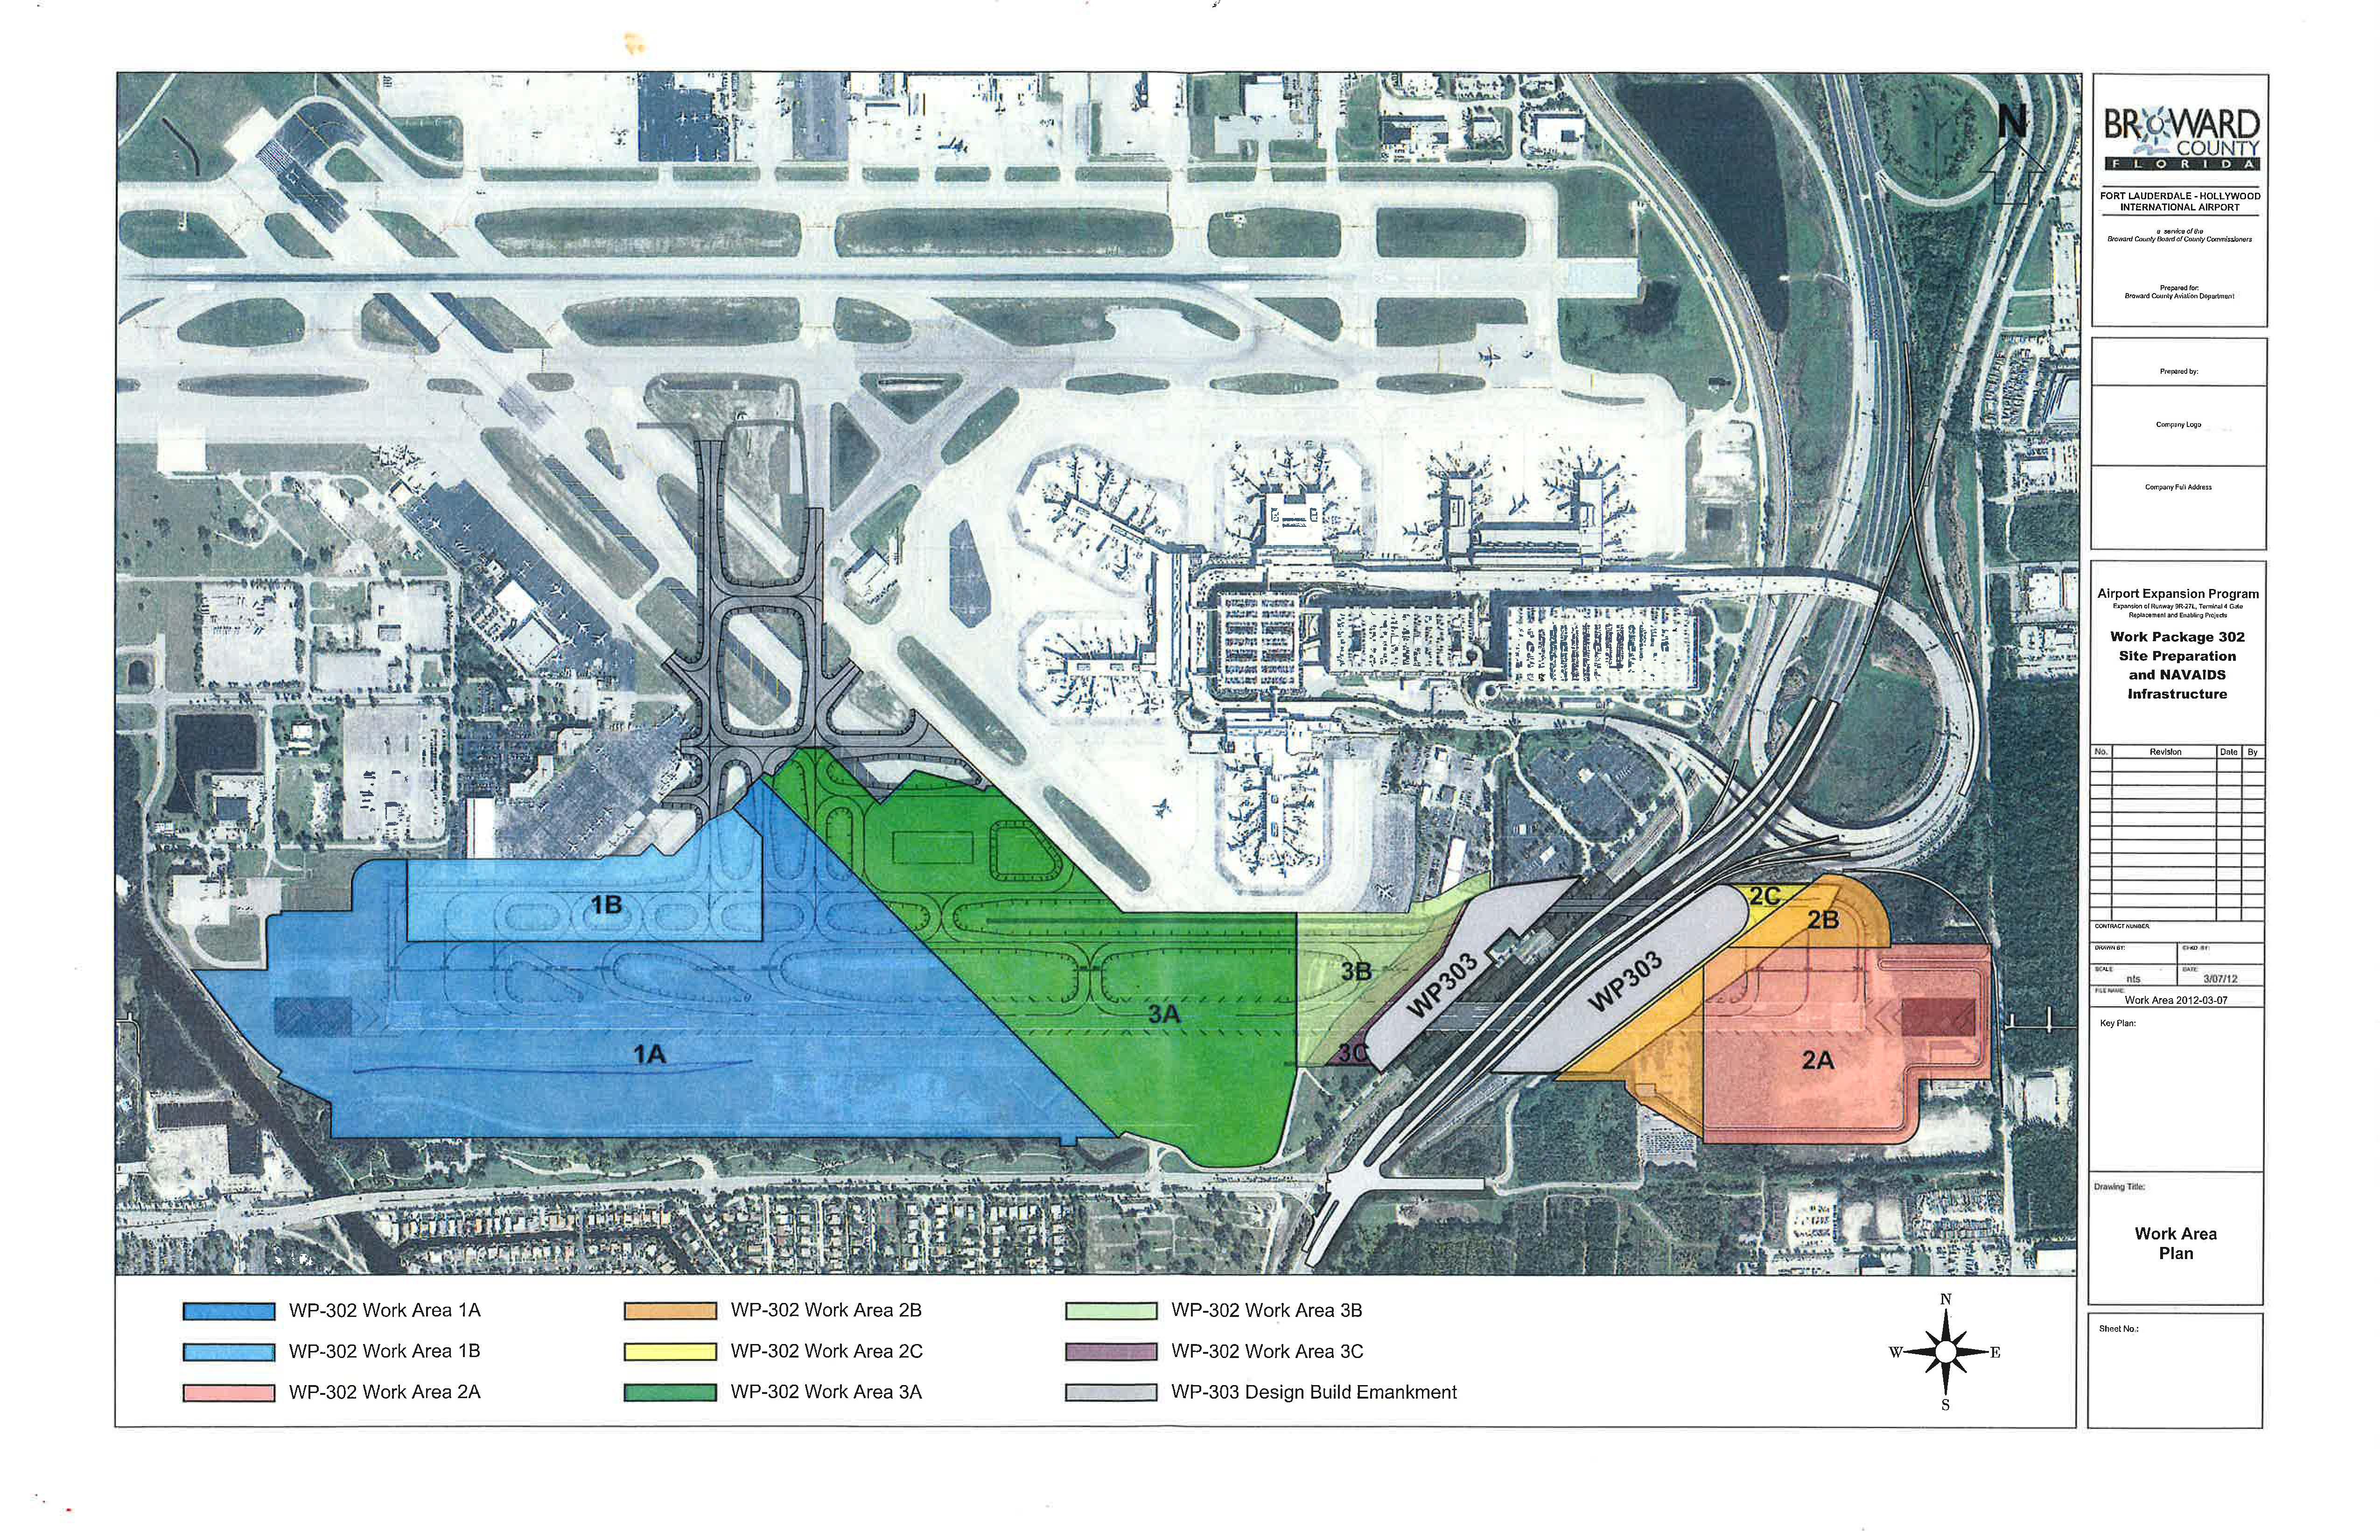 South Runway - Work Area Plan